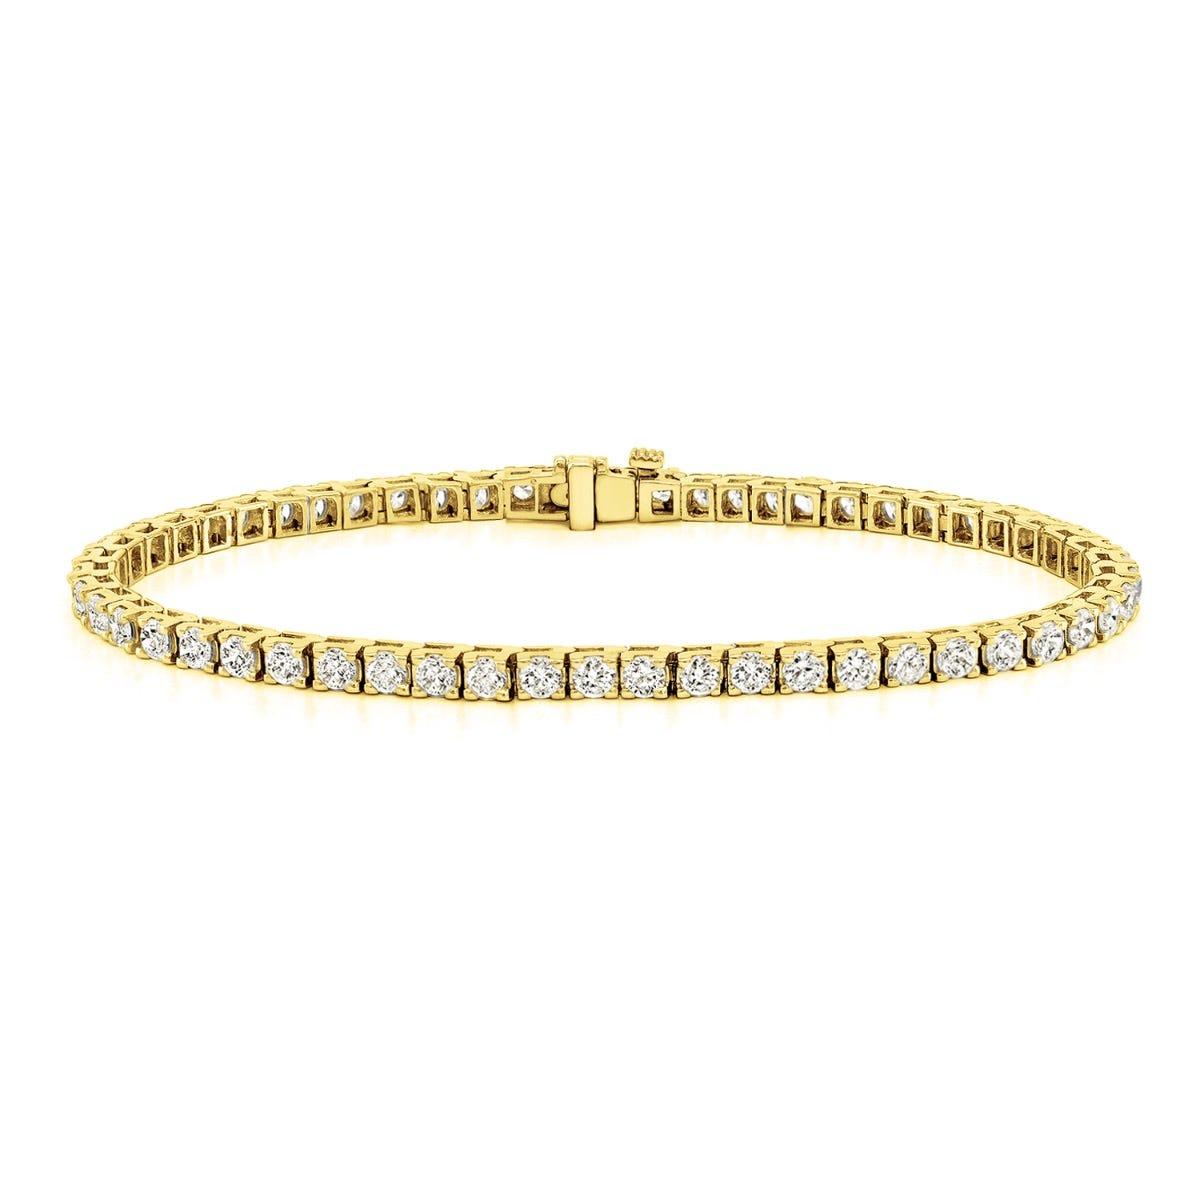 2.50ctw. 4-Prong Square Link Diamond Tennis Bracelet in 14K Yellow Gold (HI, VS1-VS2)